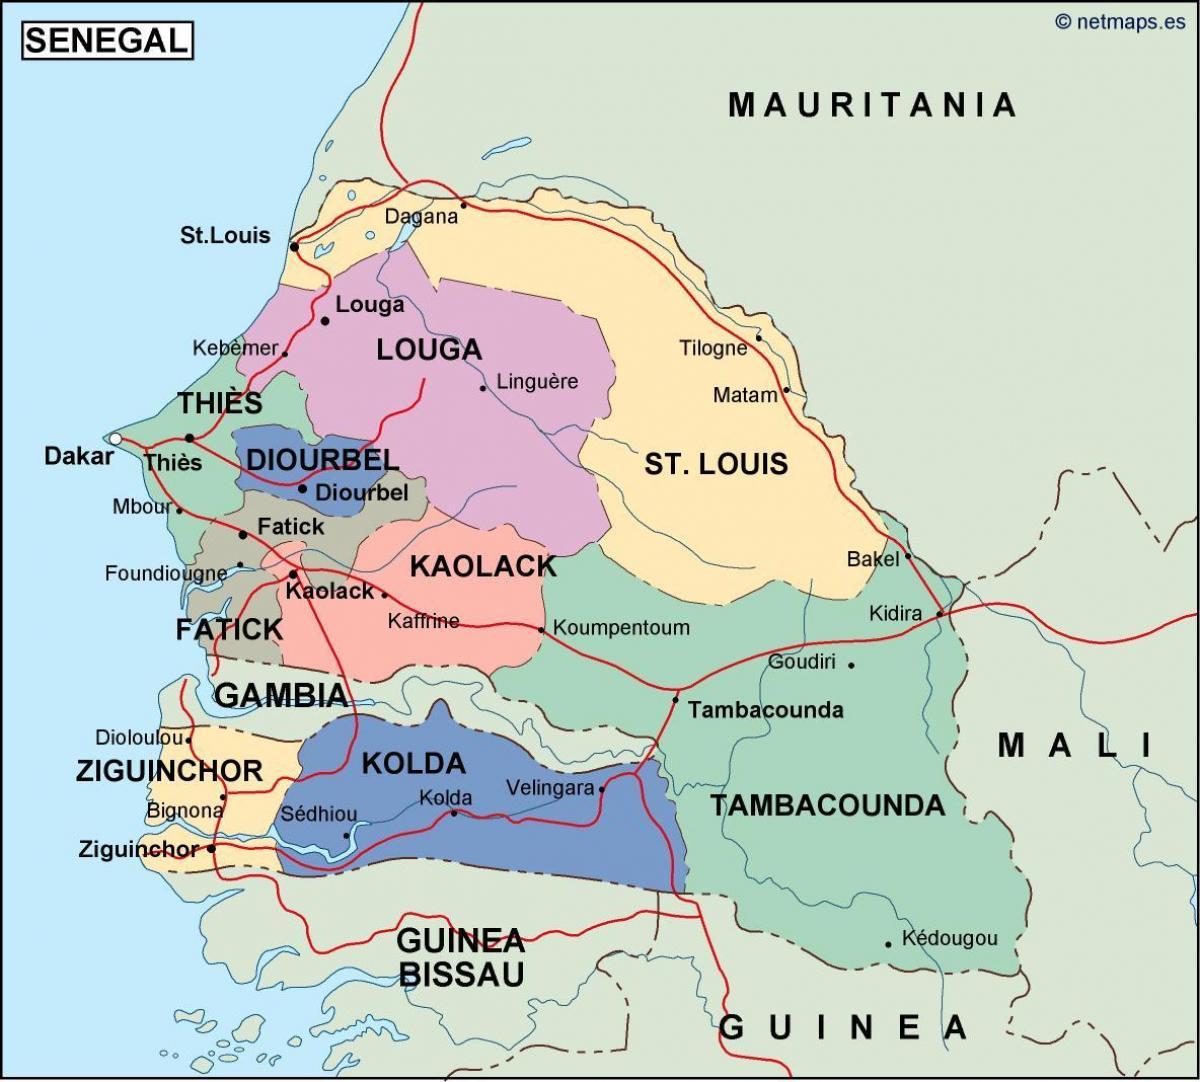 Africa Occidentale Cartina.Senegal Paese Sulla Mappa Mappa Del Senegal Paese Africa